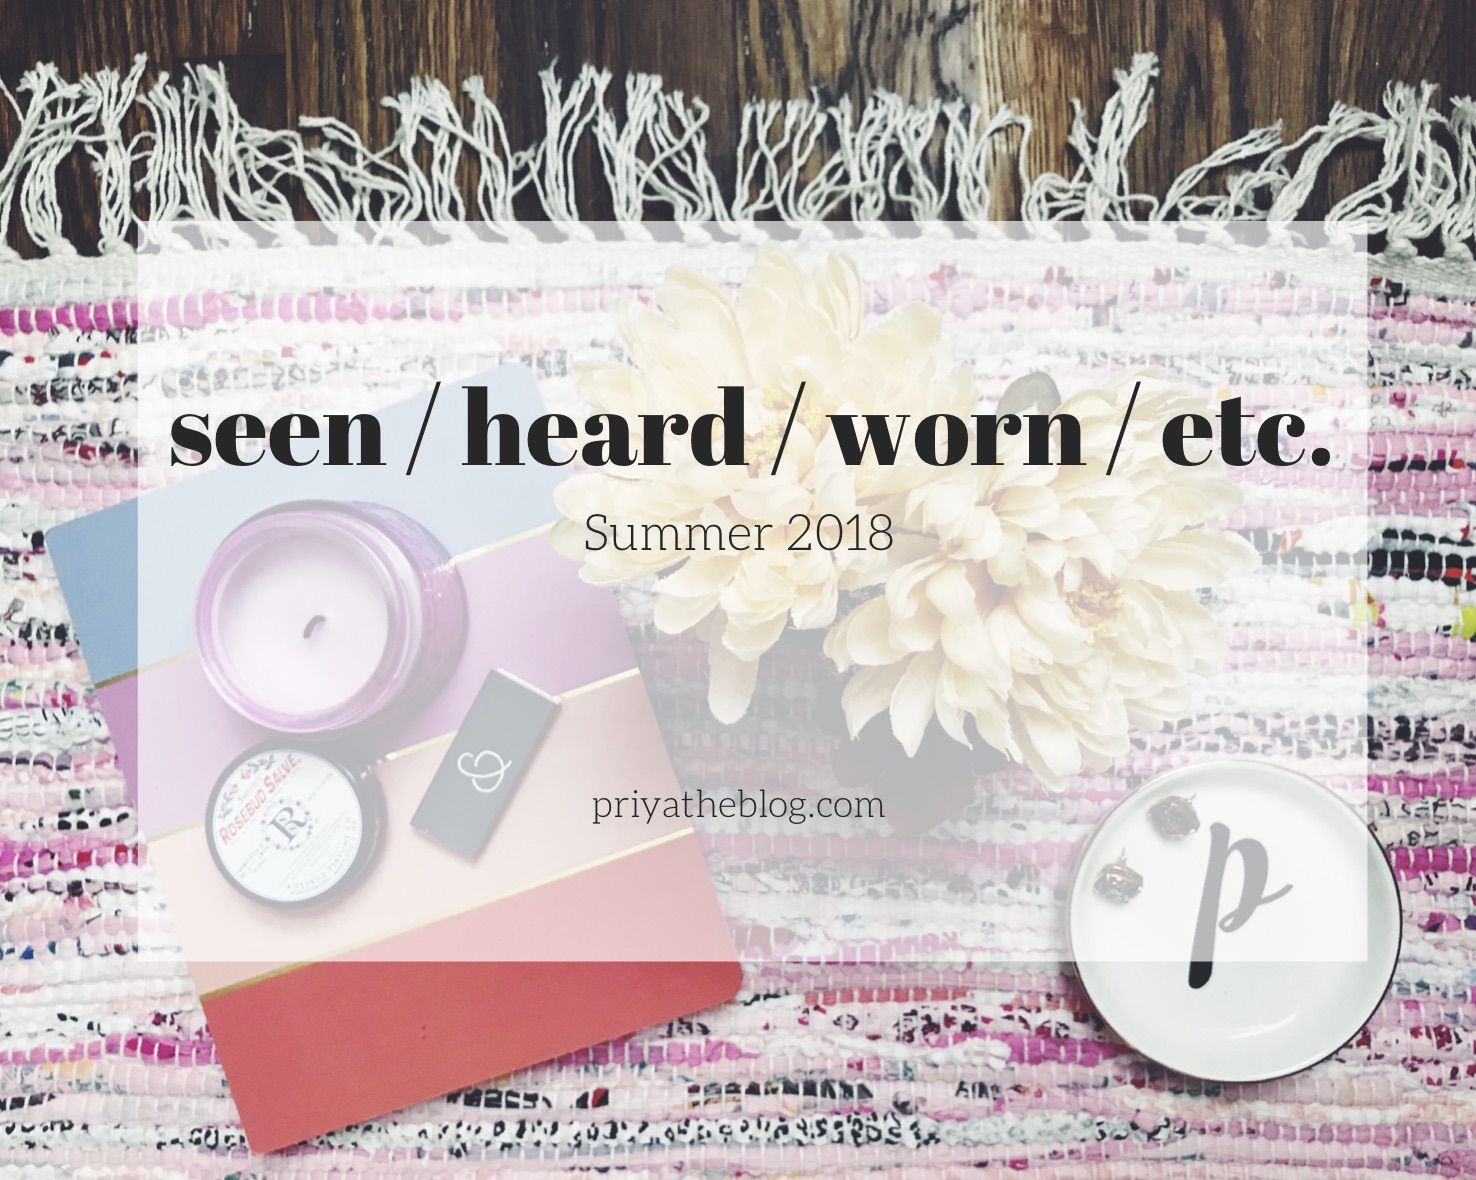 Priya the Blog, Nashville lifestyle blog, Nashville lifestyle blogger, Seen / Heard / Worn / Etc. Summer 2018, ban.do hot sauce case, The Staircase, 2 Dope Queens, book reviews, Sharp Objects